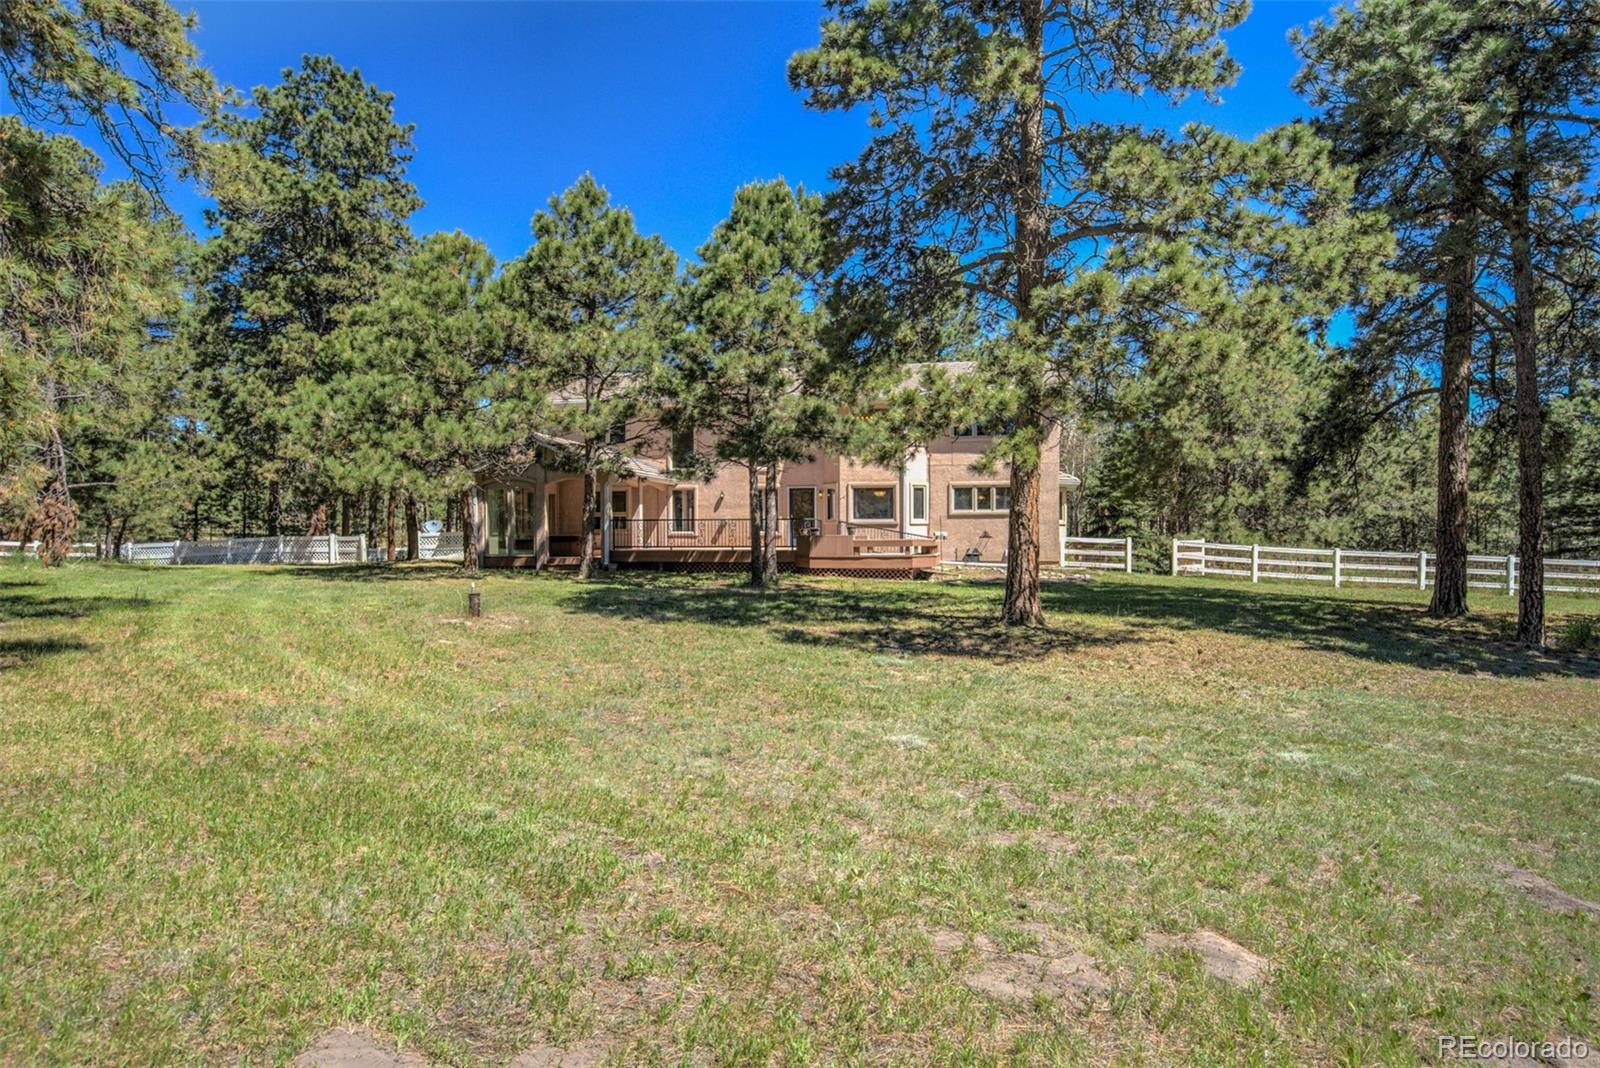 MLS# 2707350 - 37 - 17310 Charter Pines , Colorado Springs, CO 80132